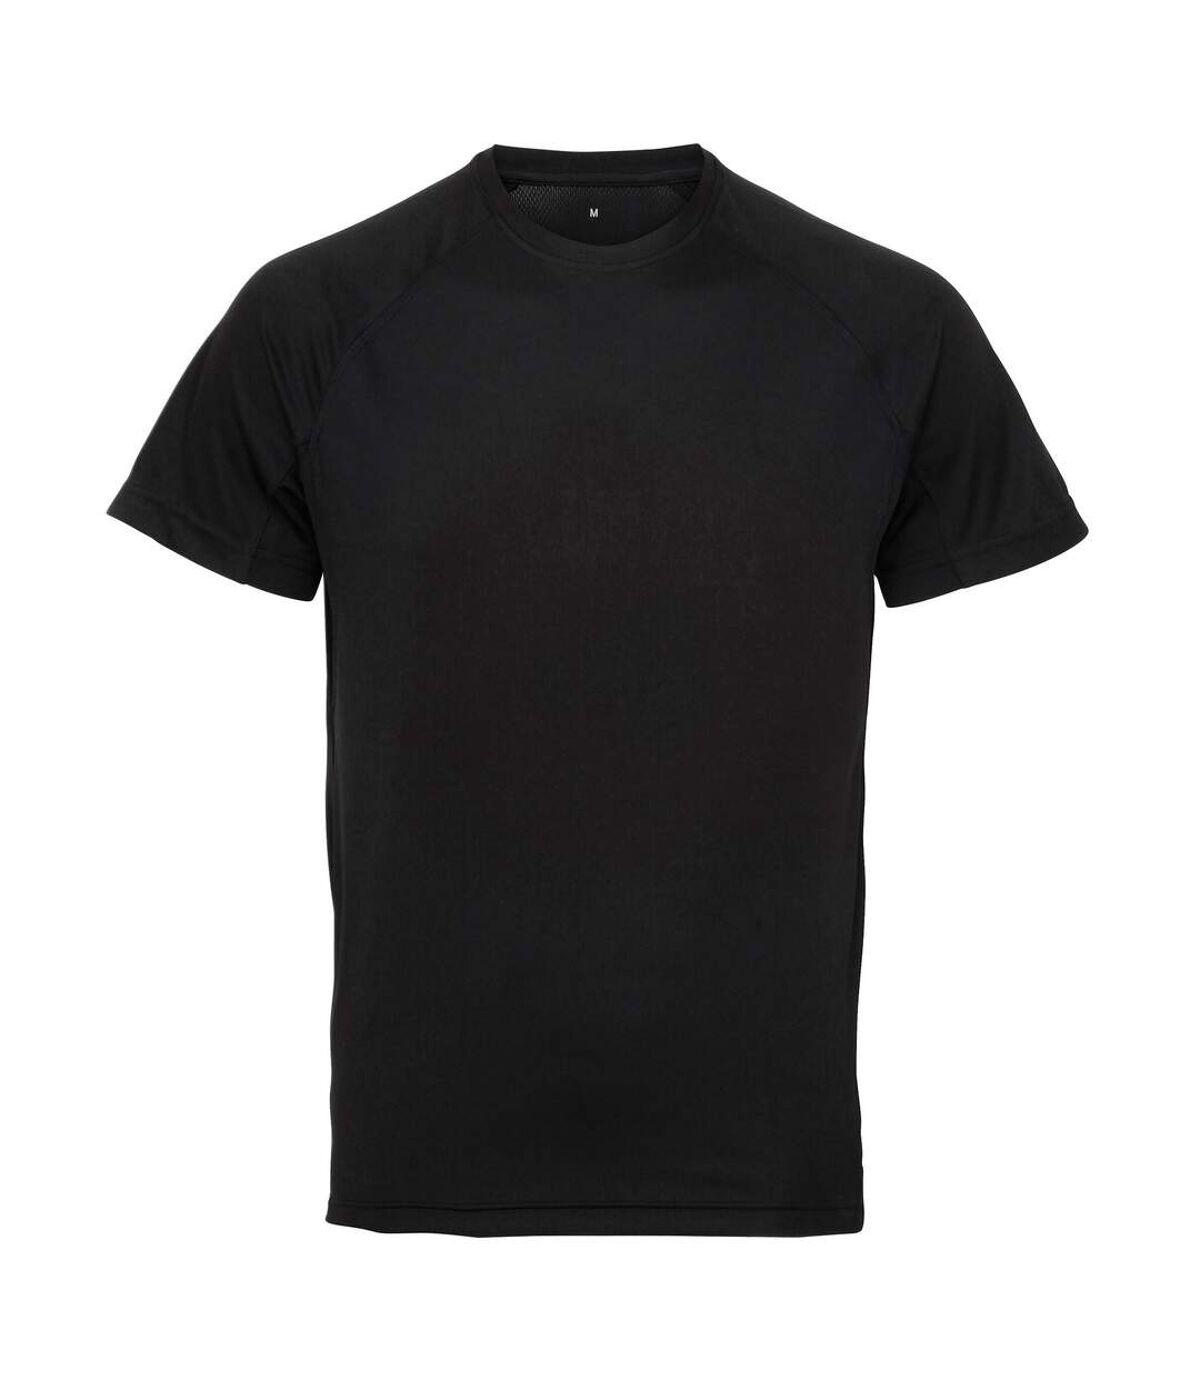 Tri Dri Mens Panelled Short Sleeve T-Shirt (Black) - UTRW4799